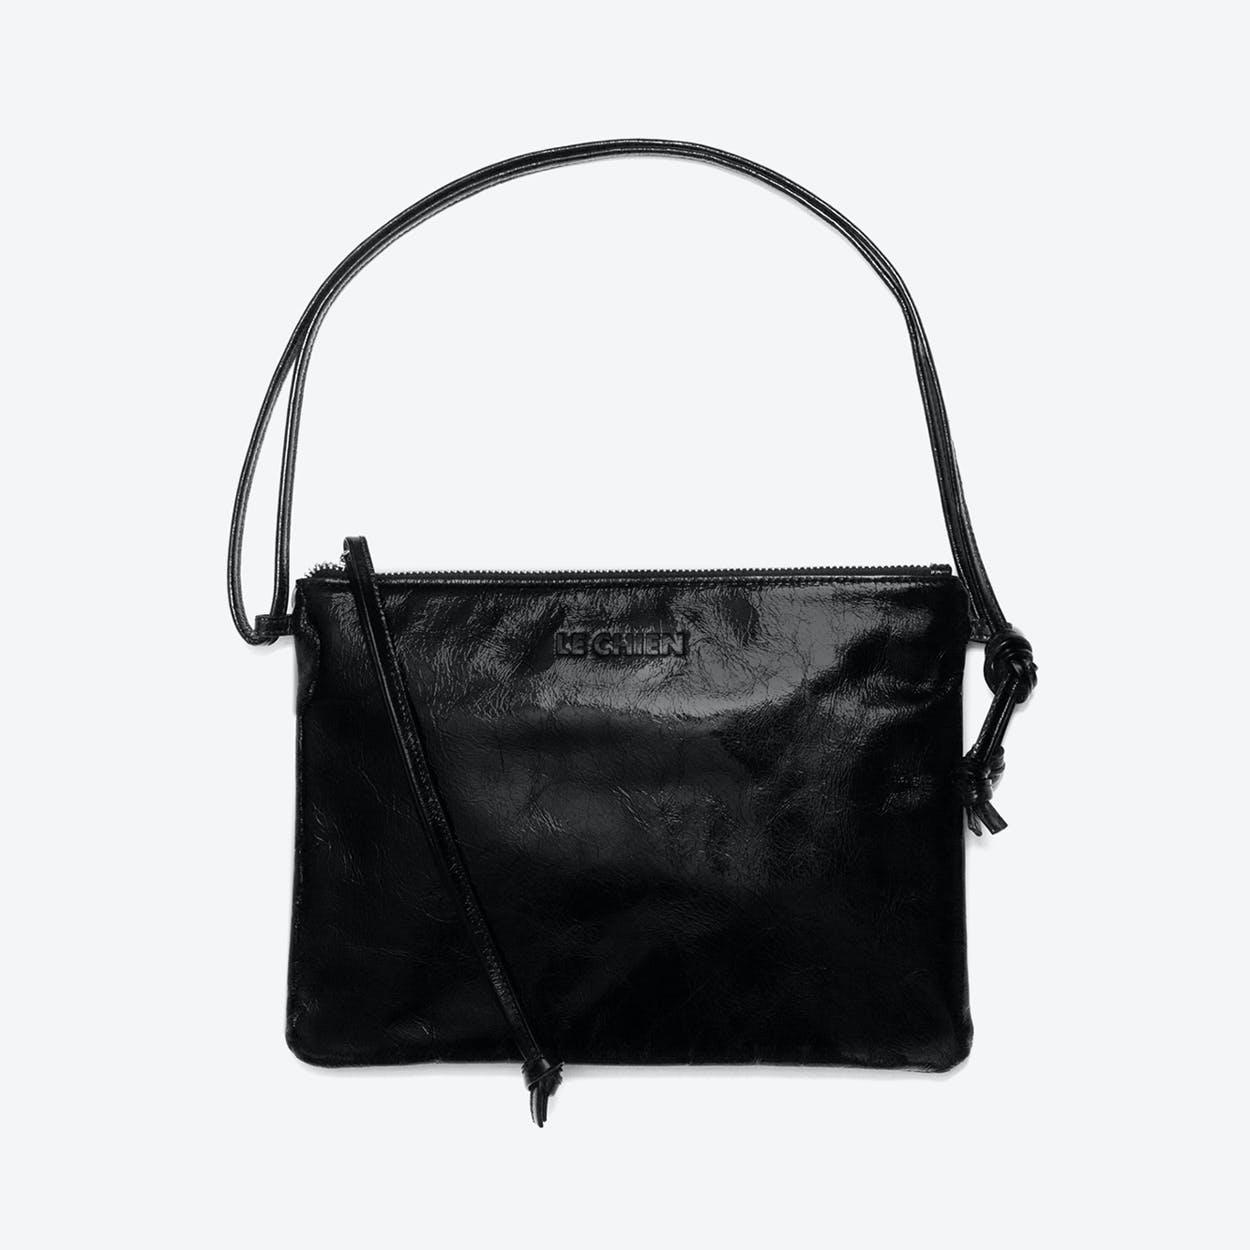 Pinscher Crossbody Bag in Black/Shine